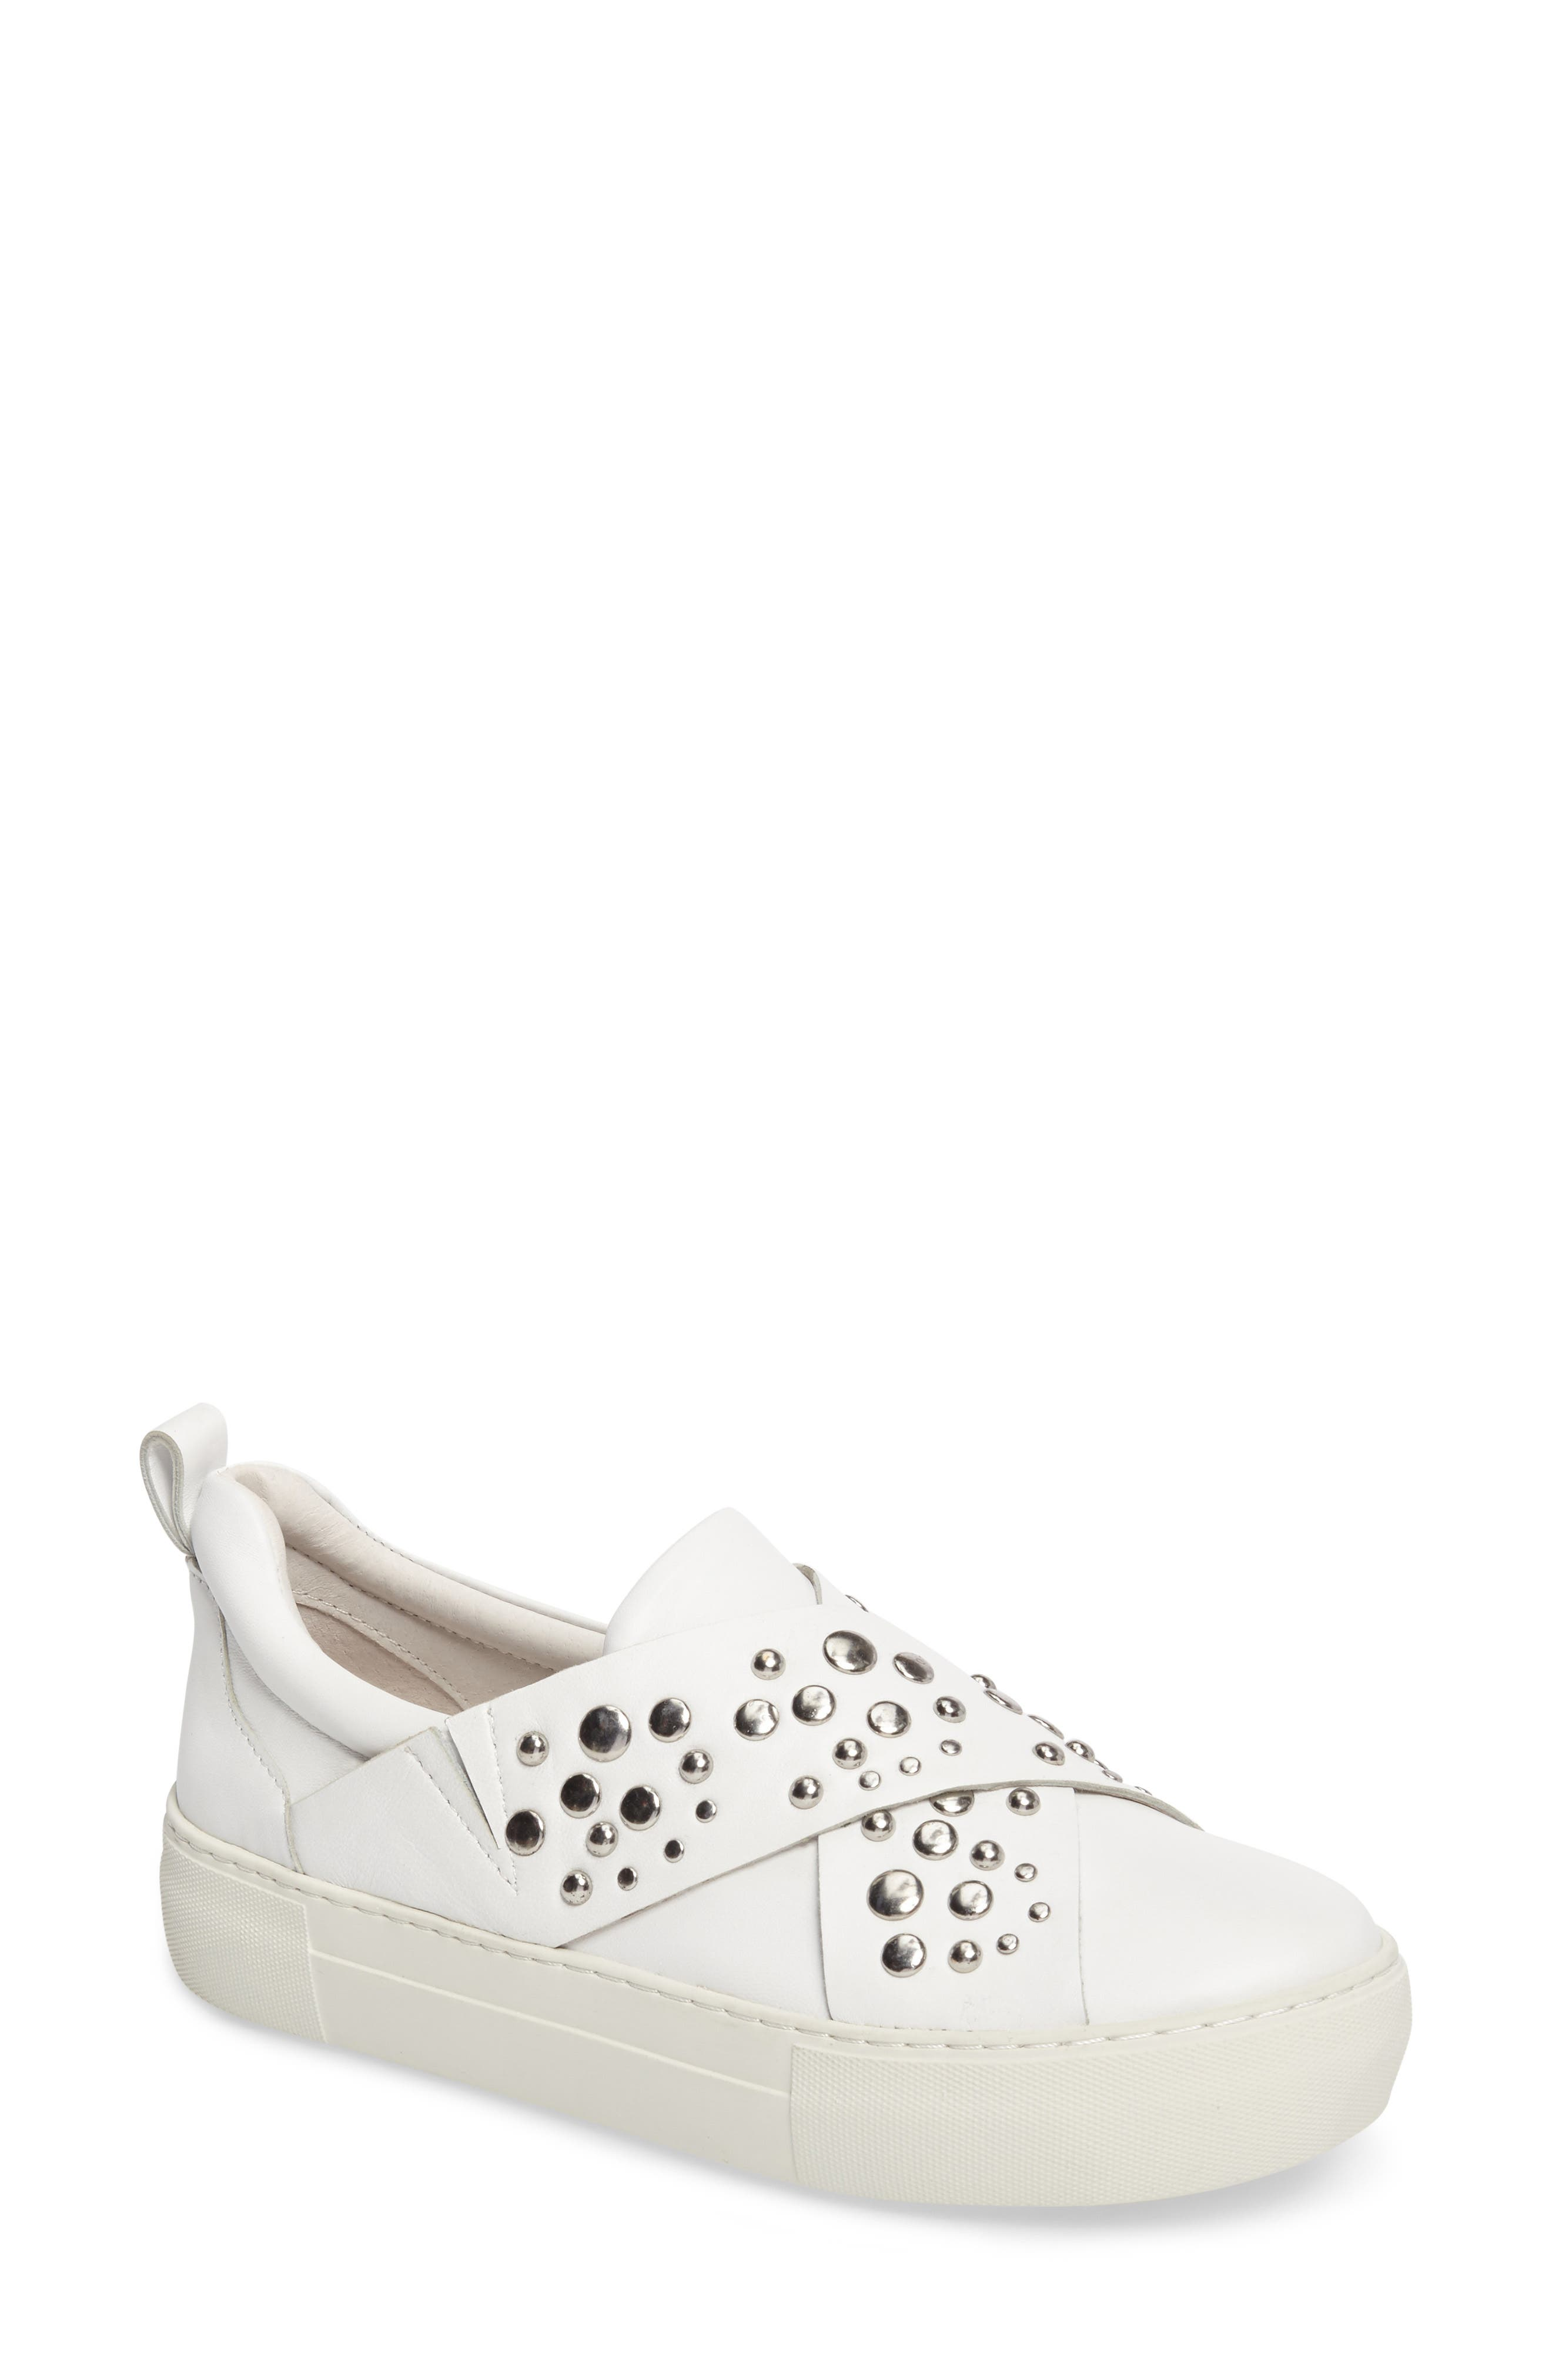 Alternate Image 1 Selected - JSlides Anteek Slip-On Sneaker (Women)